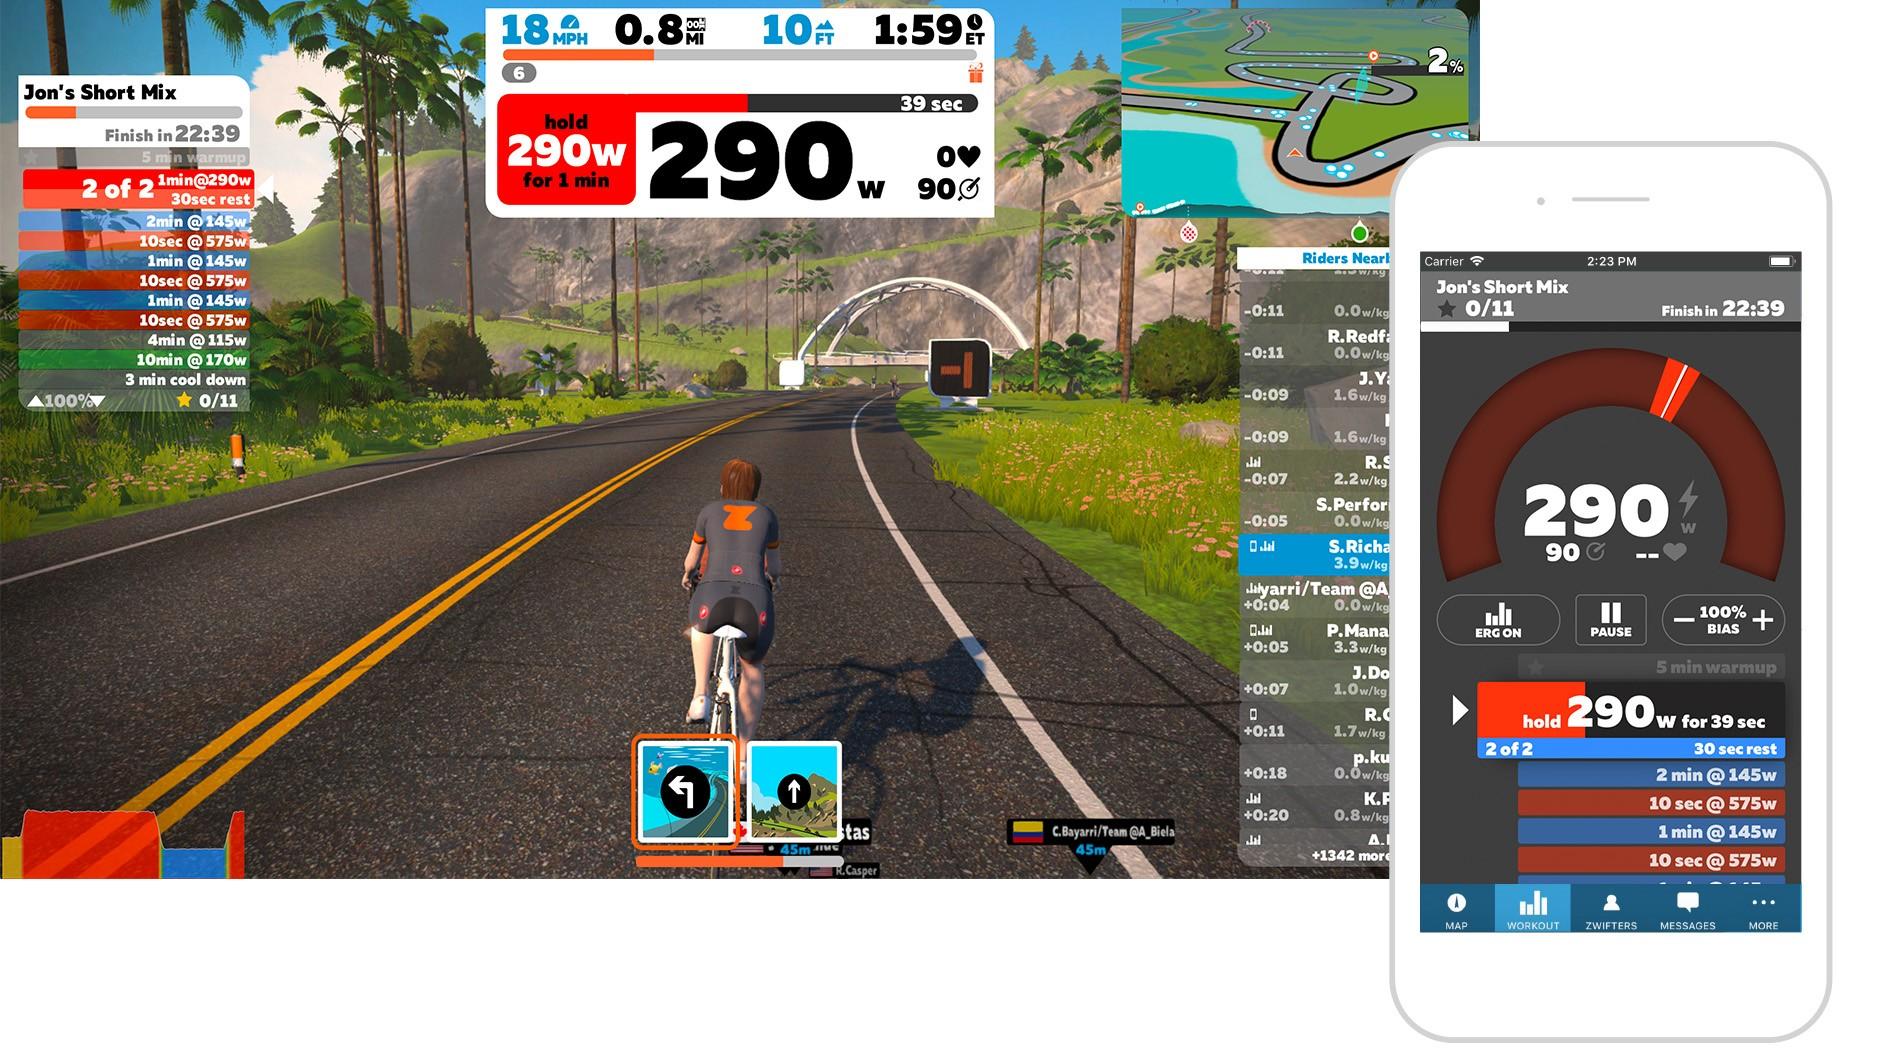 Zwift Companion app